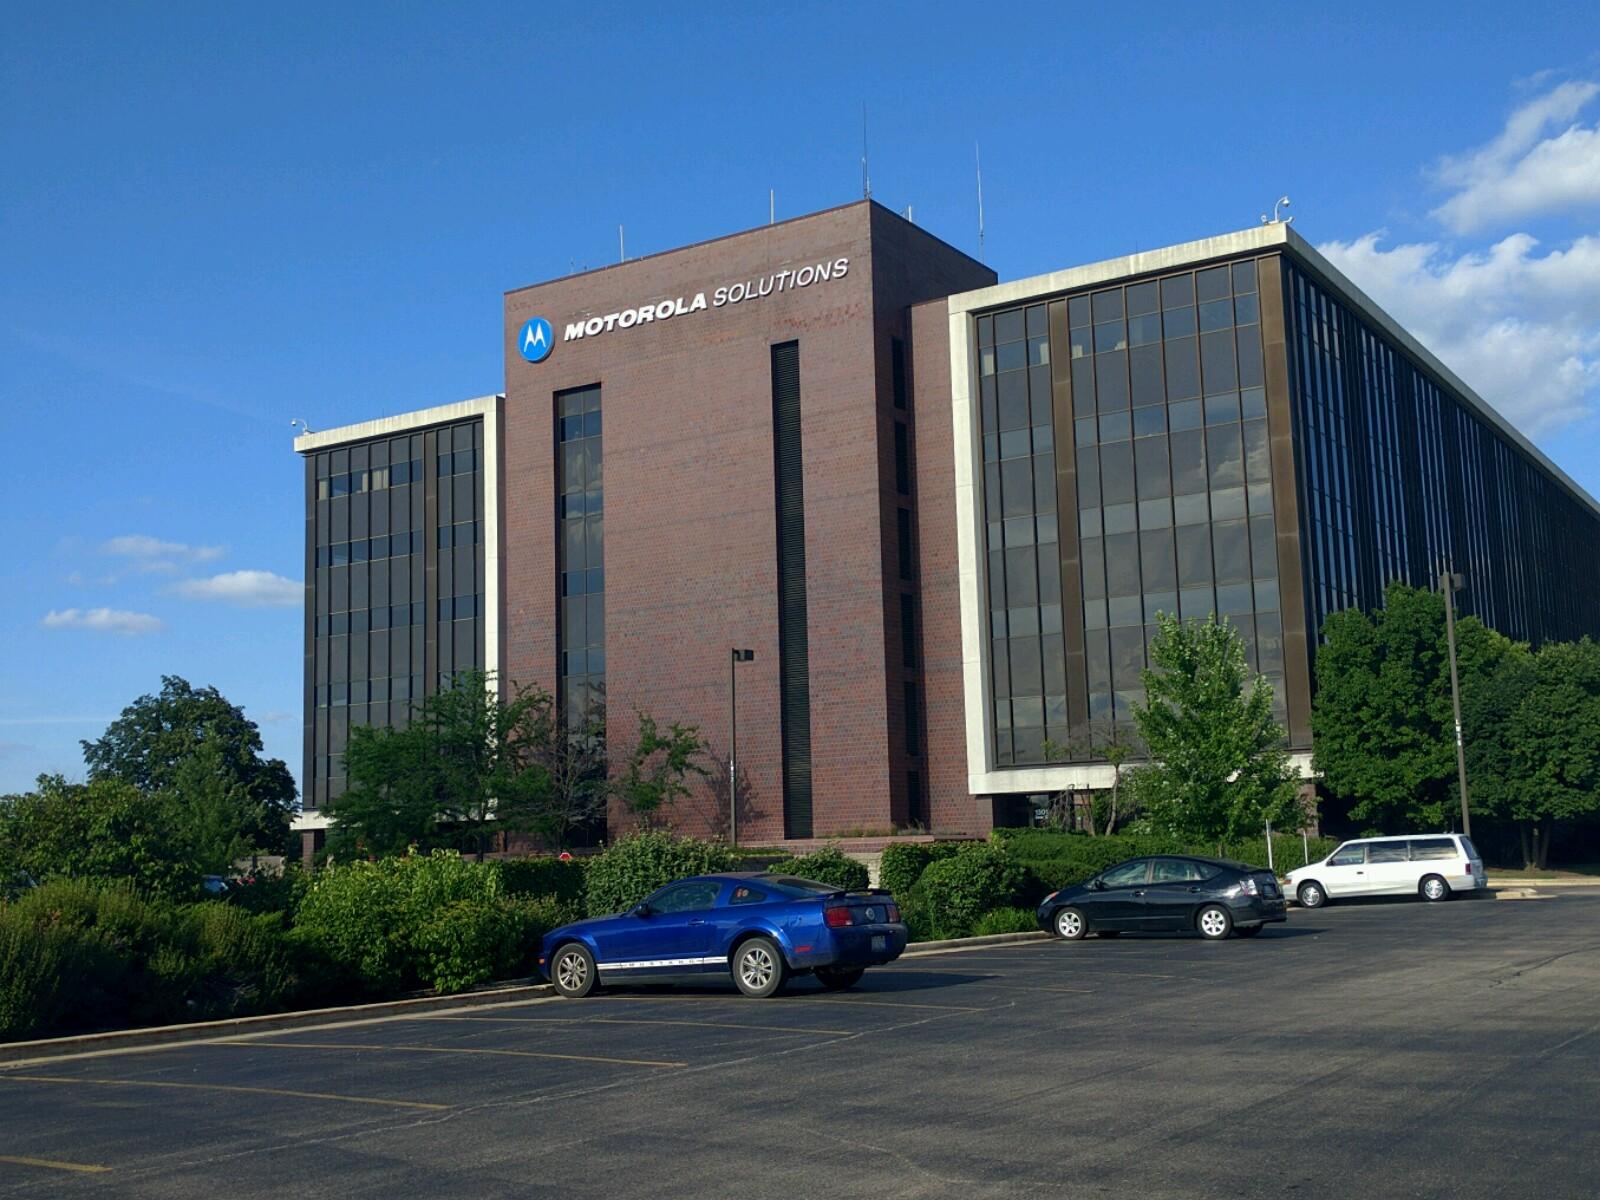 Building F on Motorola Solutions' corporate campus in Schaumburg, Illinois.